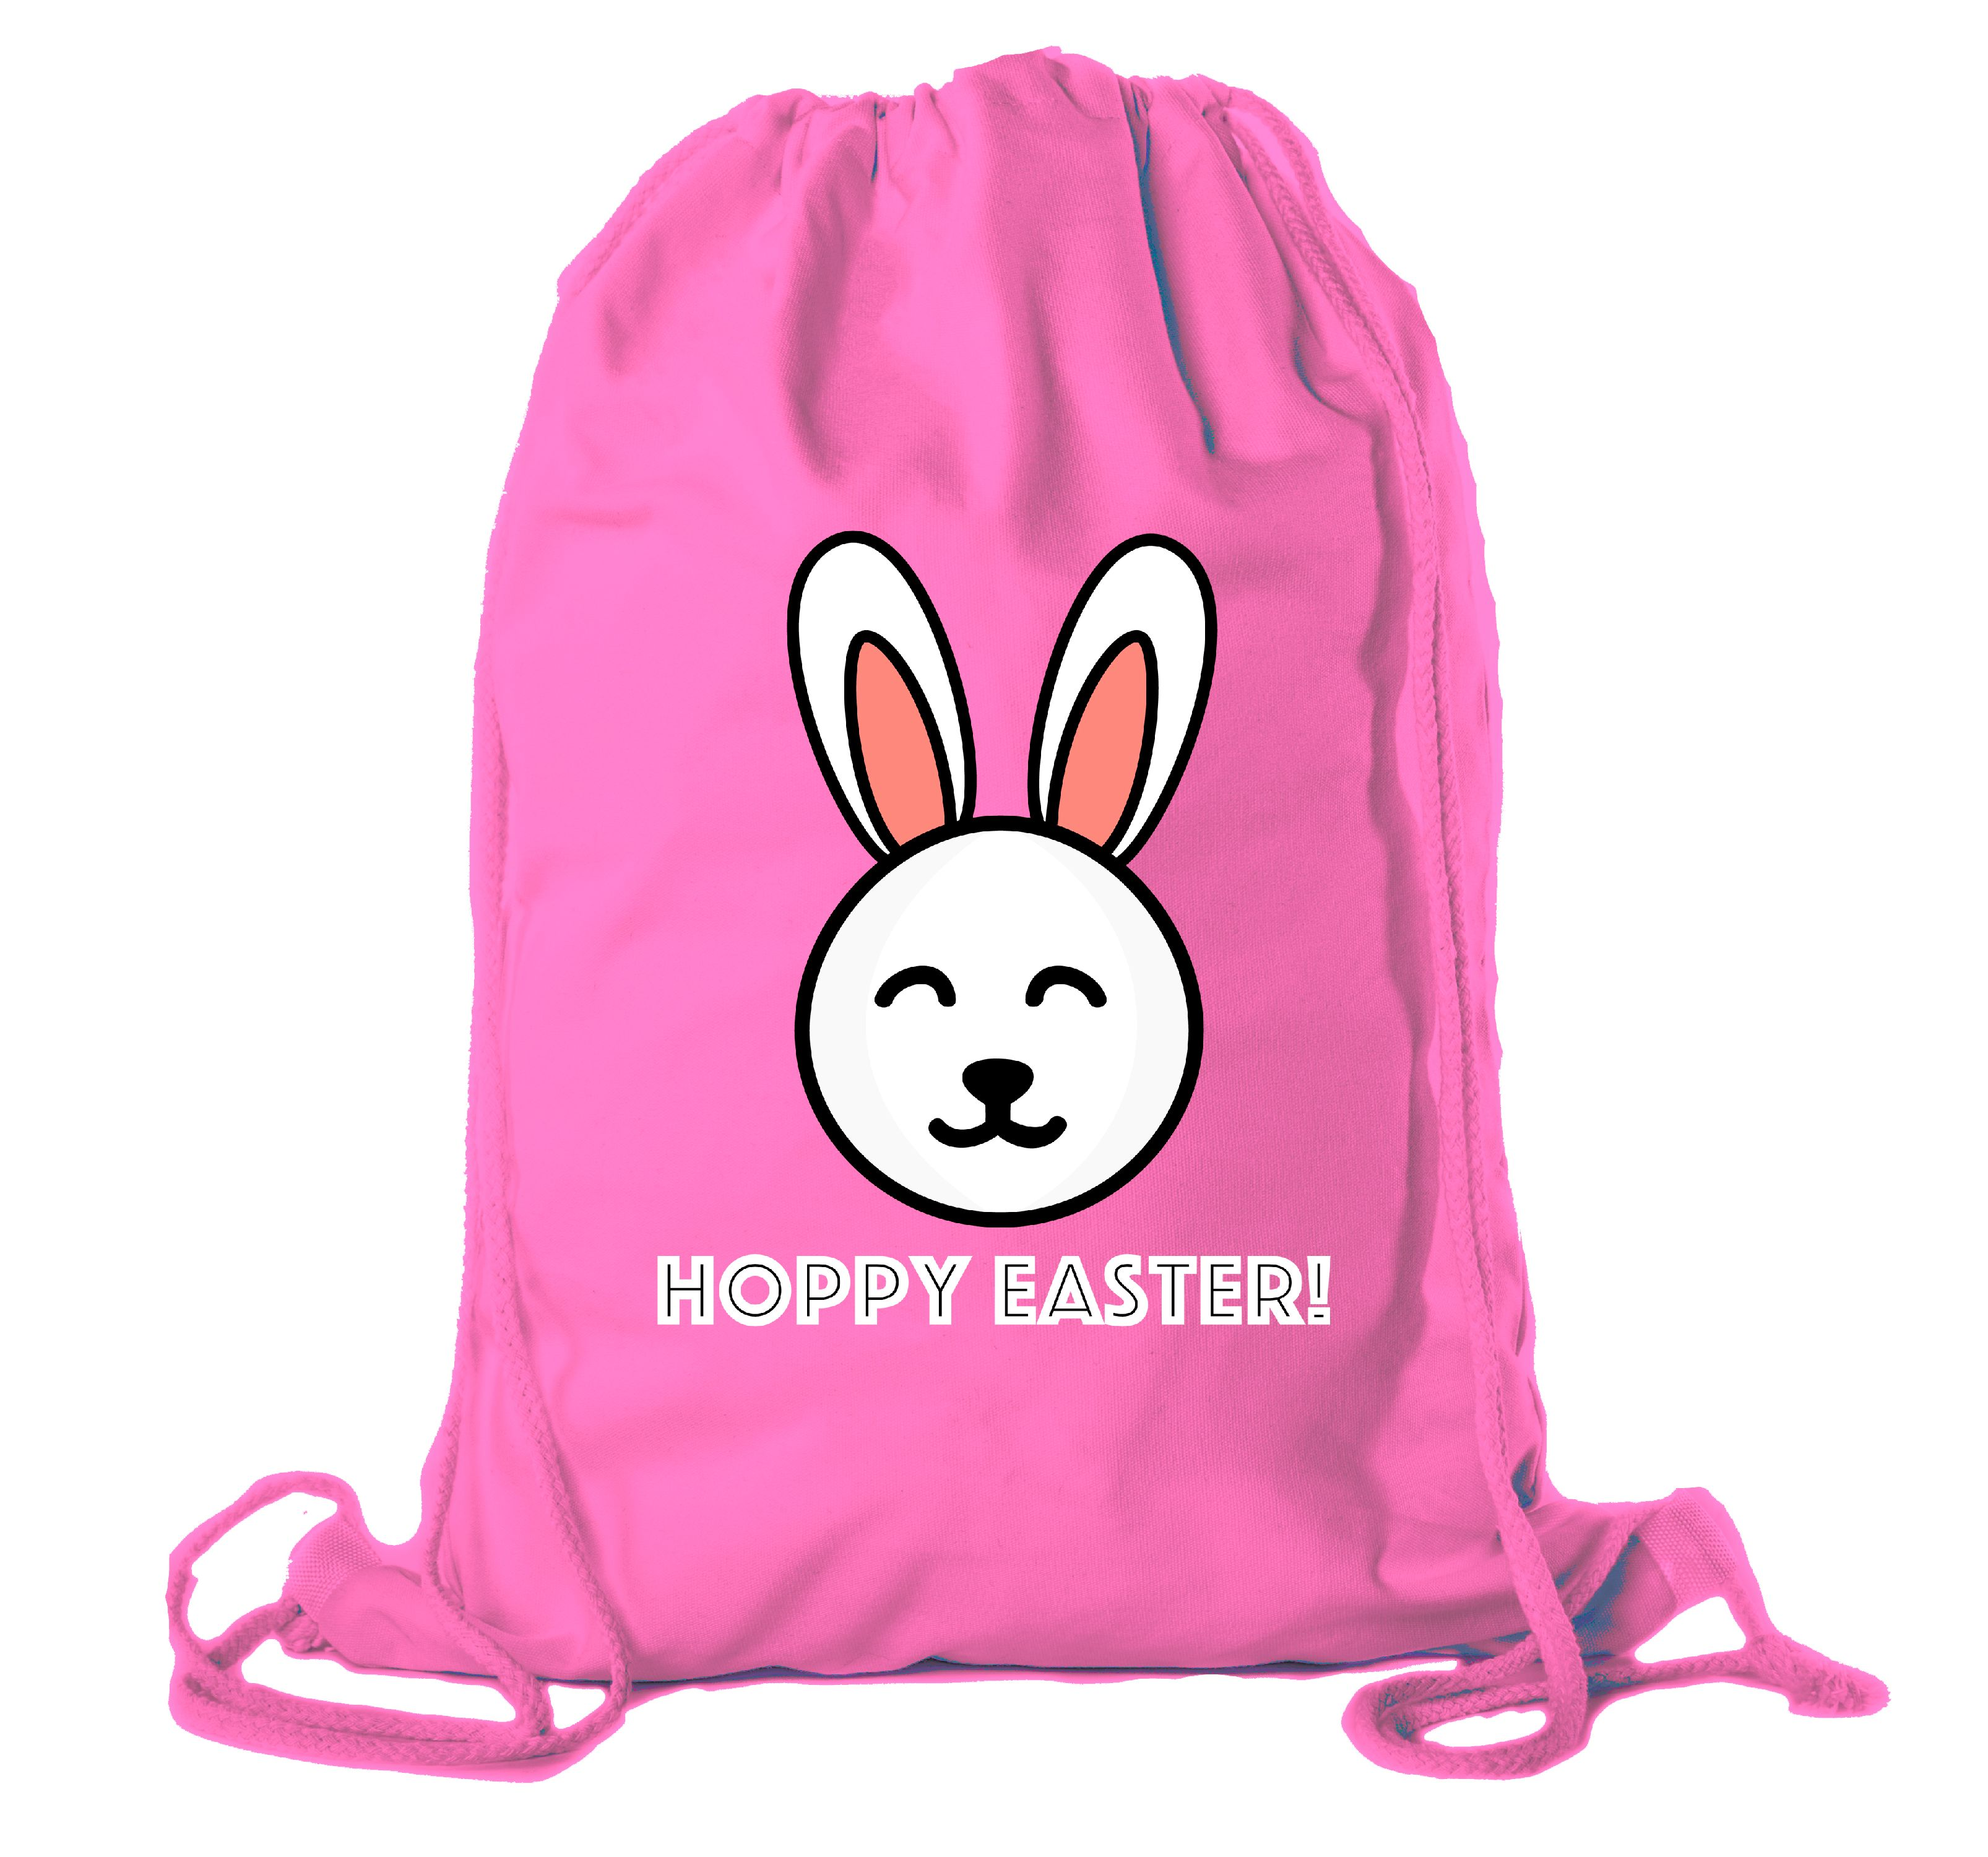 Easter Basket Backpack Bulk Cotton Drawstring Cinch Bags Easter Bunny Gift Bags - Hoppy Easter